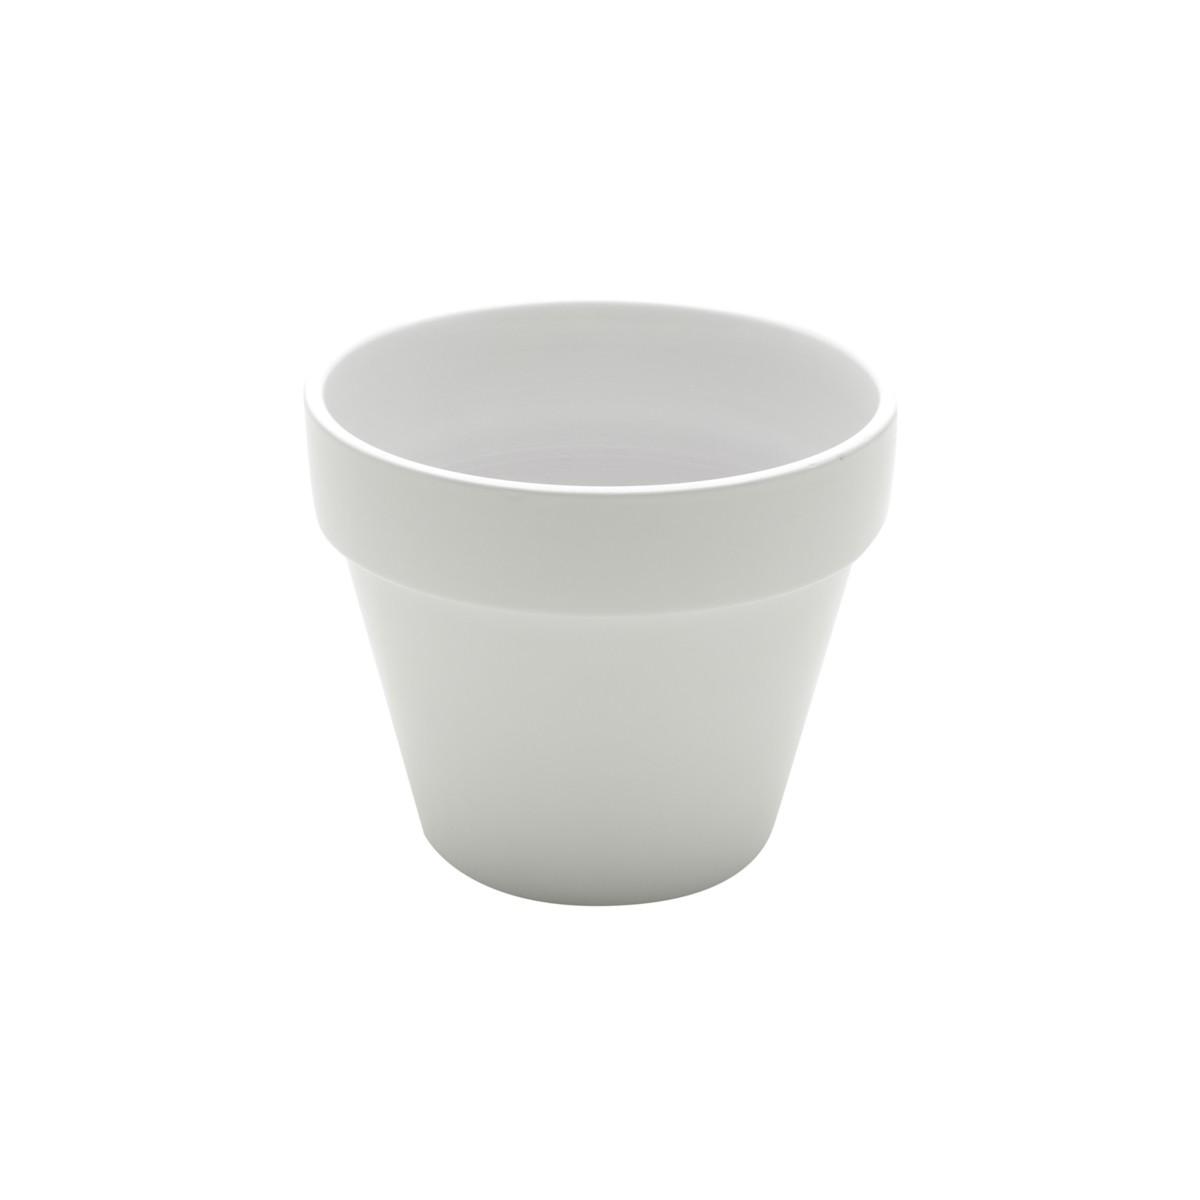 Vaso Decorativo de Ceramica Redondo Branco - Urban